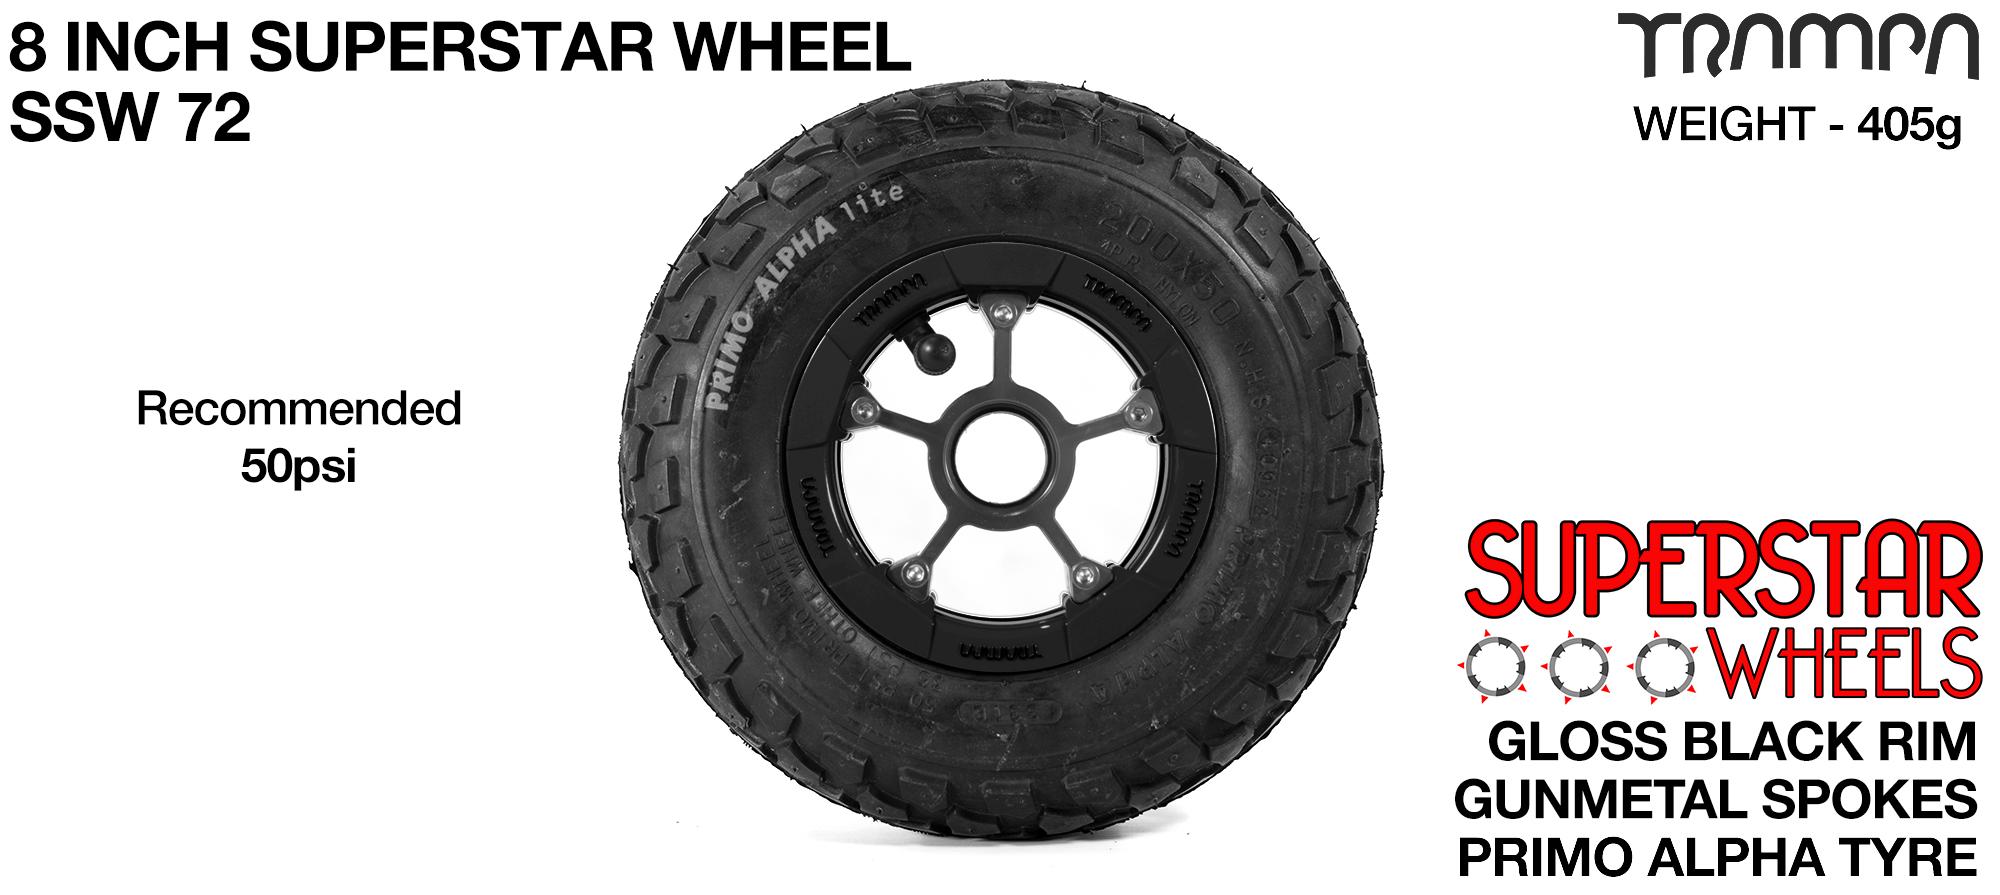 Superstar 8 inch wheel - Black Gloss Rim with Gunmetal Anodised spokes & Black Alpha 8 Inch Tyre